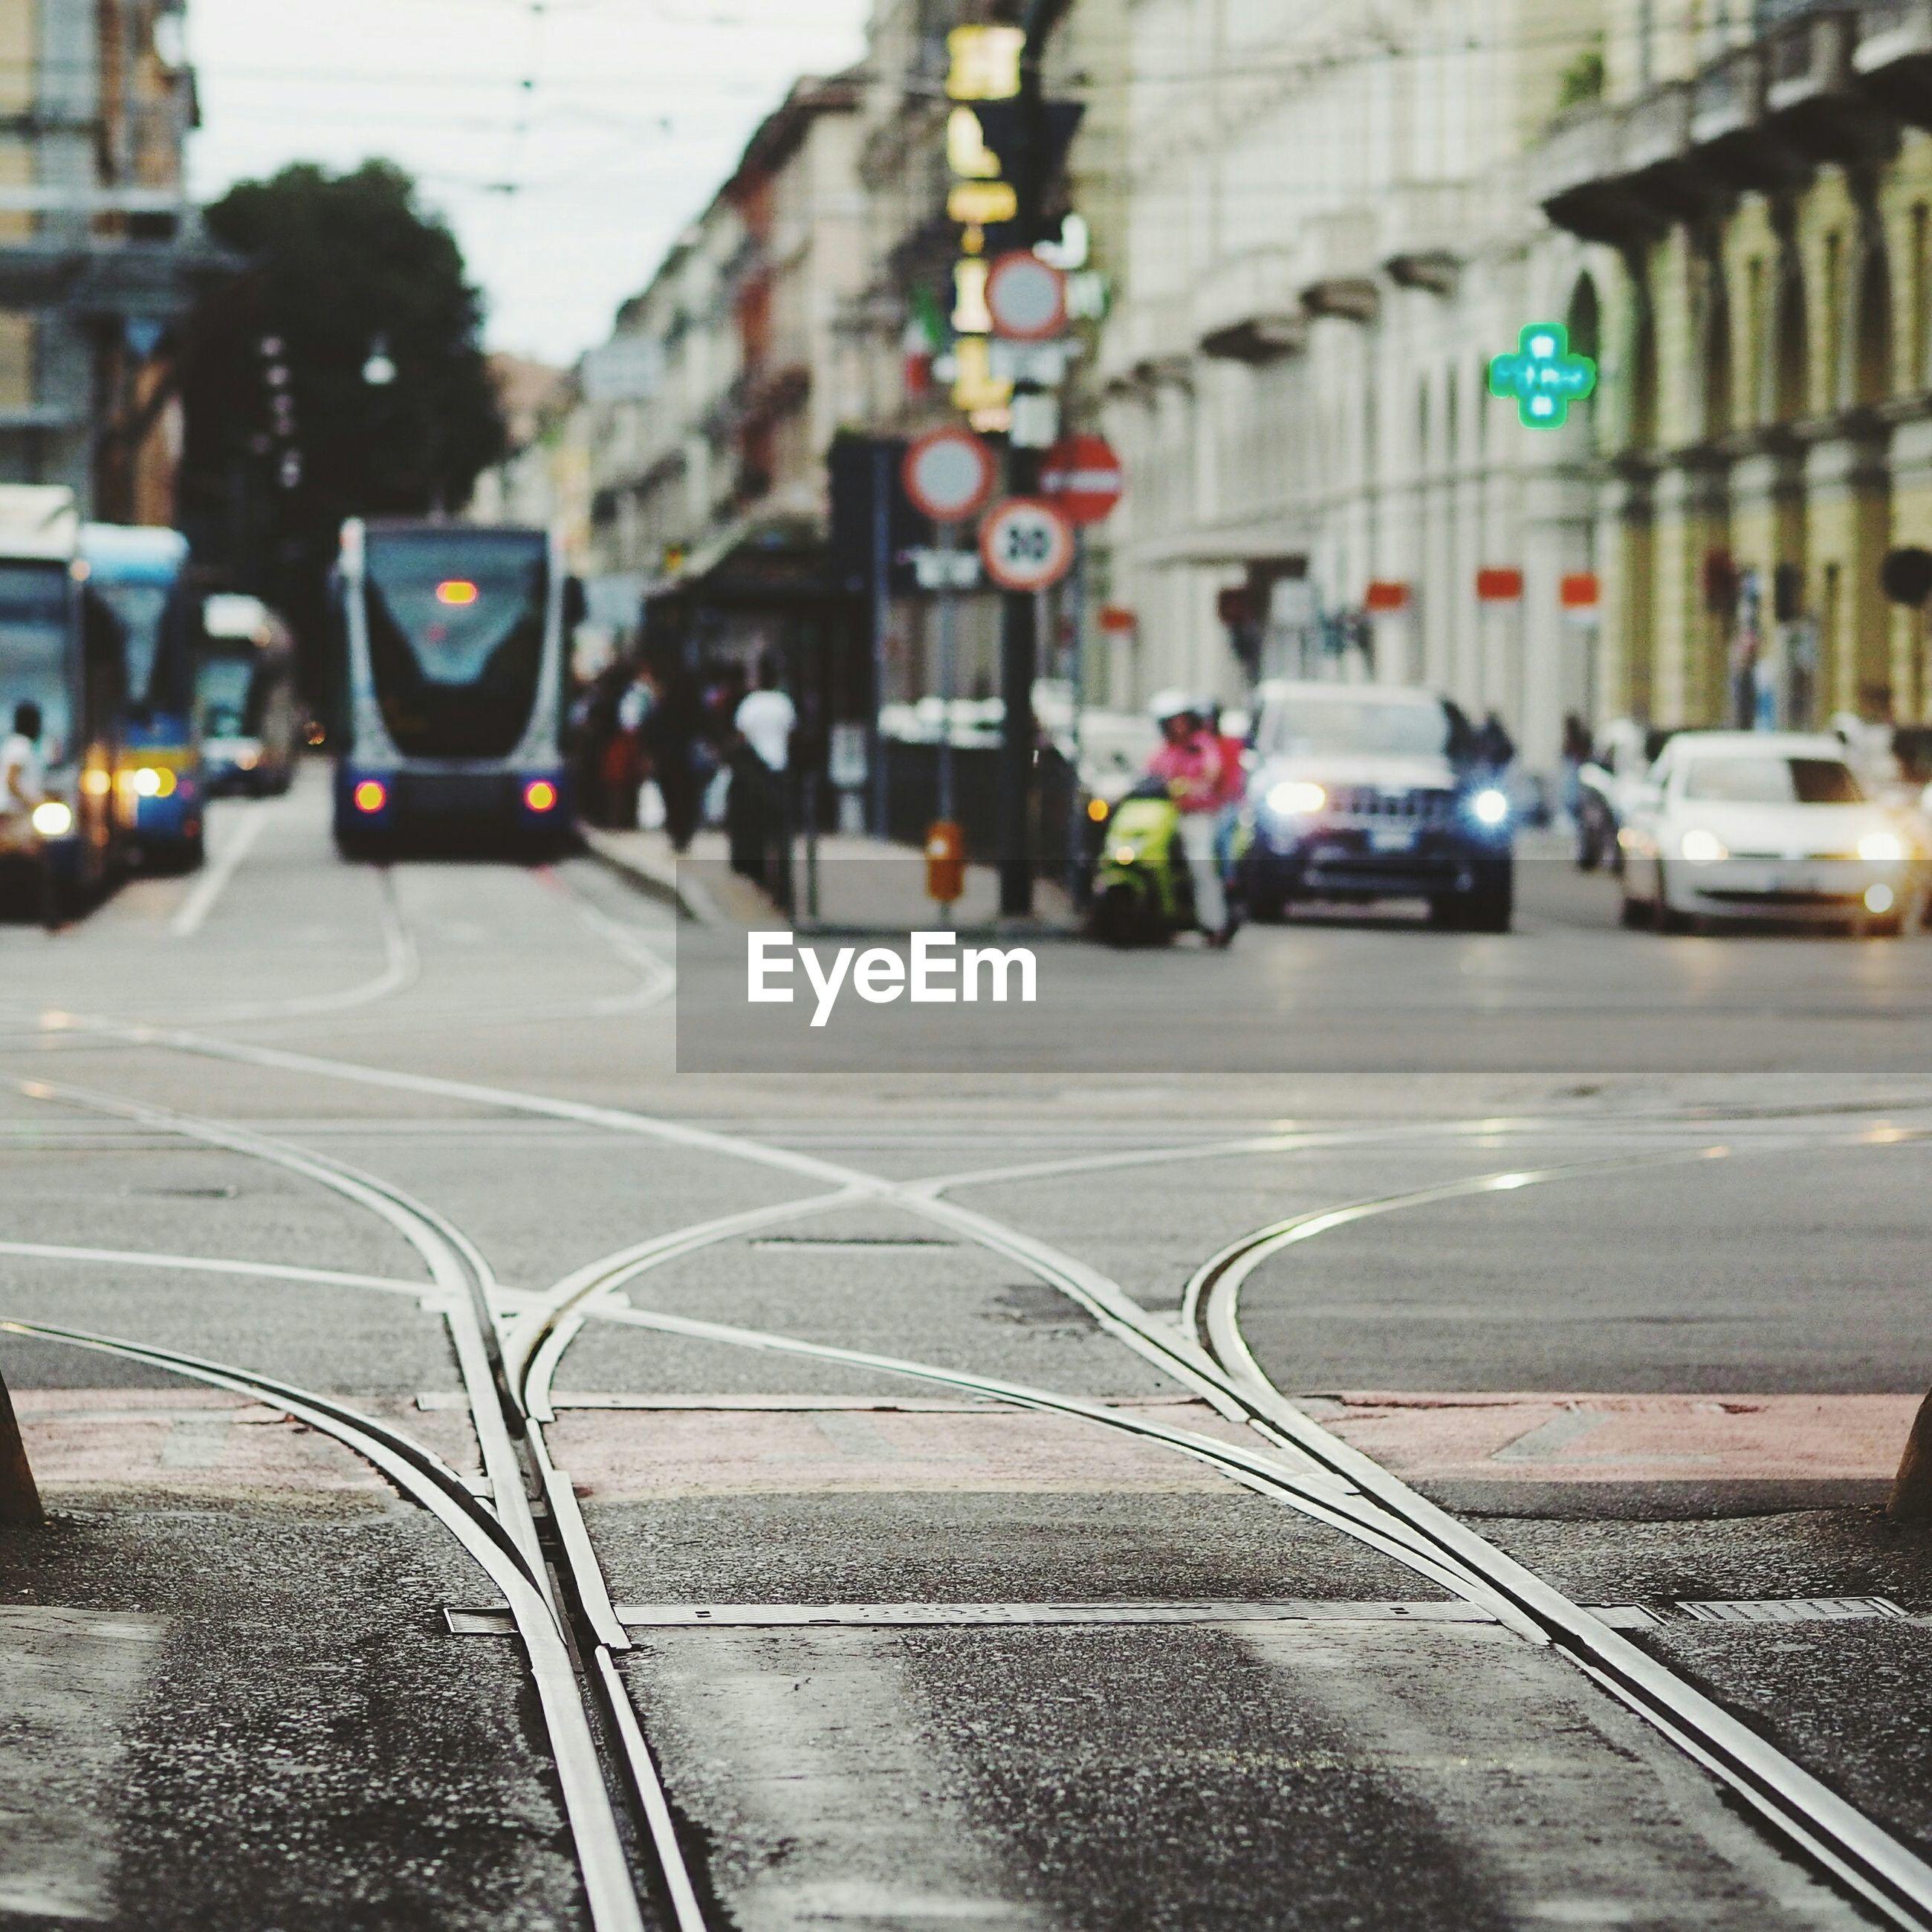 Tramway tracks on city street